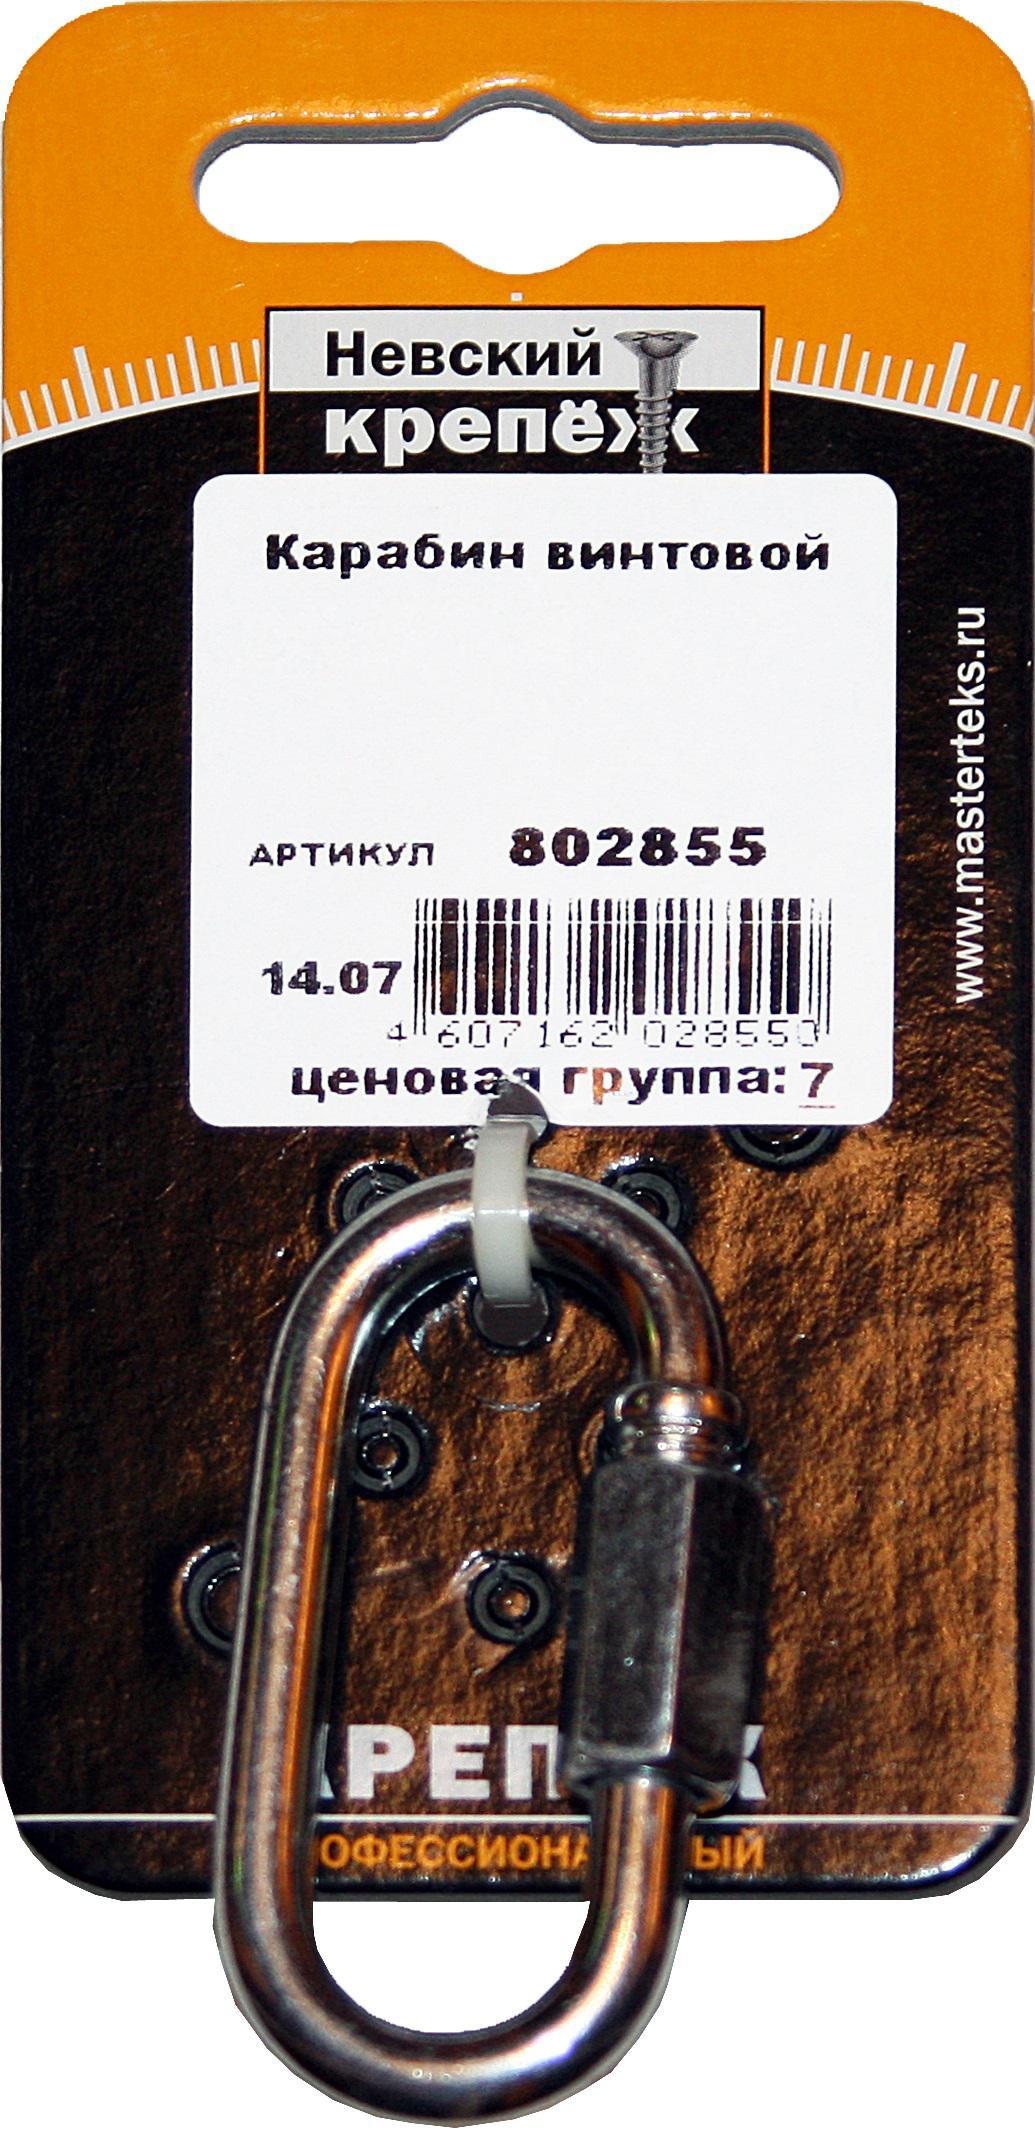 Карабин НЕВСКИЙ КРЕПЕЖ 802857